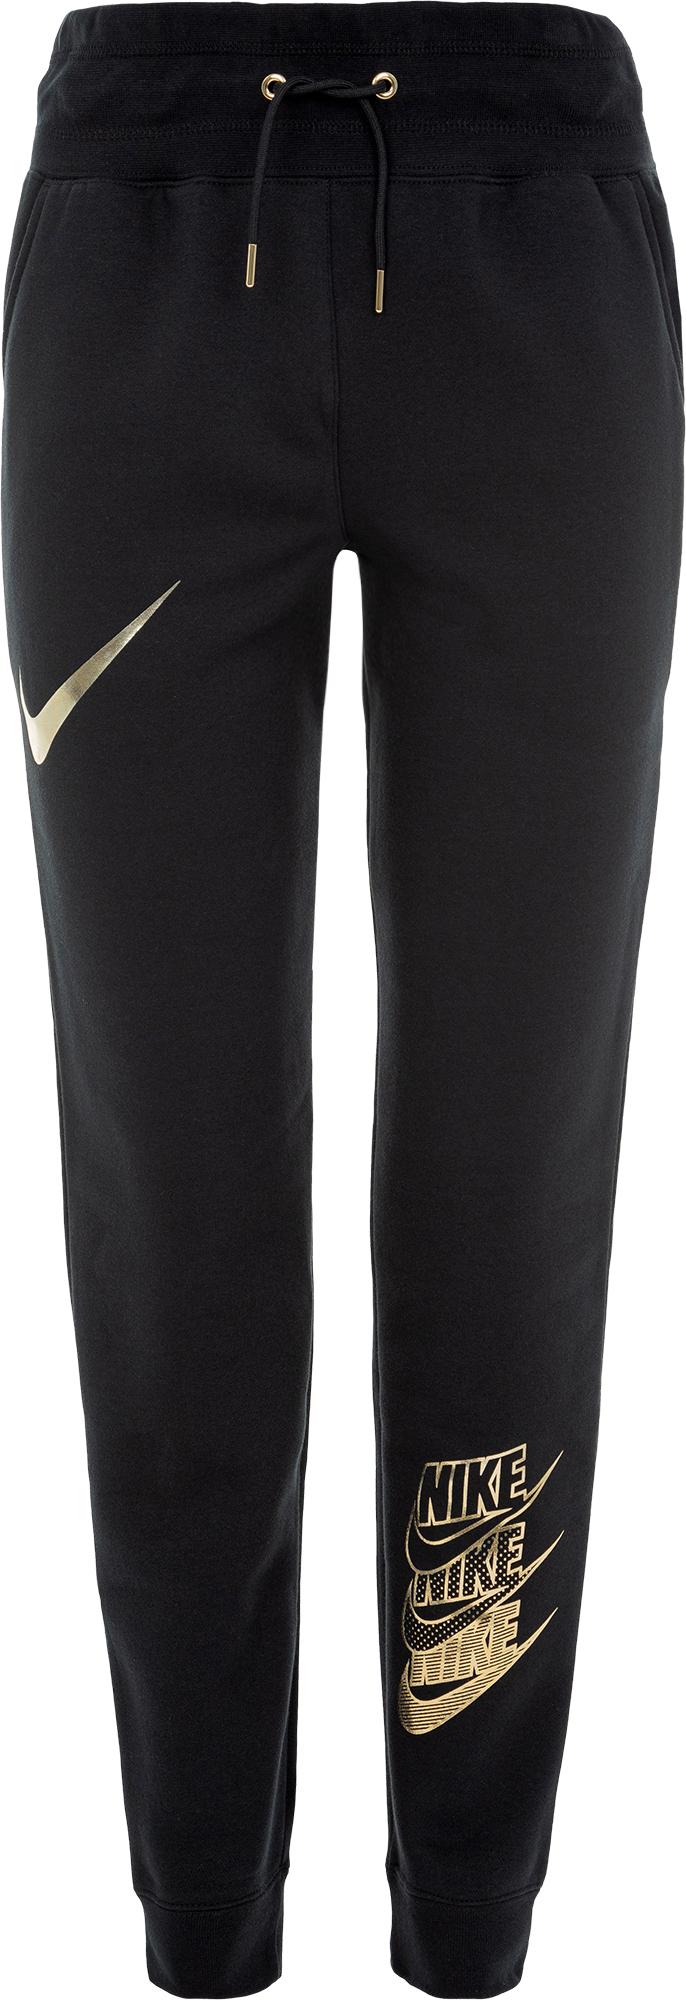 Nike Брюки женские Nike Sportswear , размер 48-50 леггинсы женские nike sportswear leggings цвет серый 883657 036 размер m 46 48